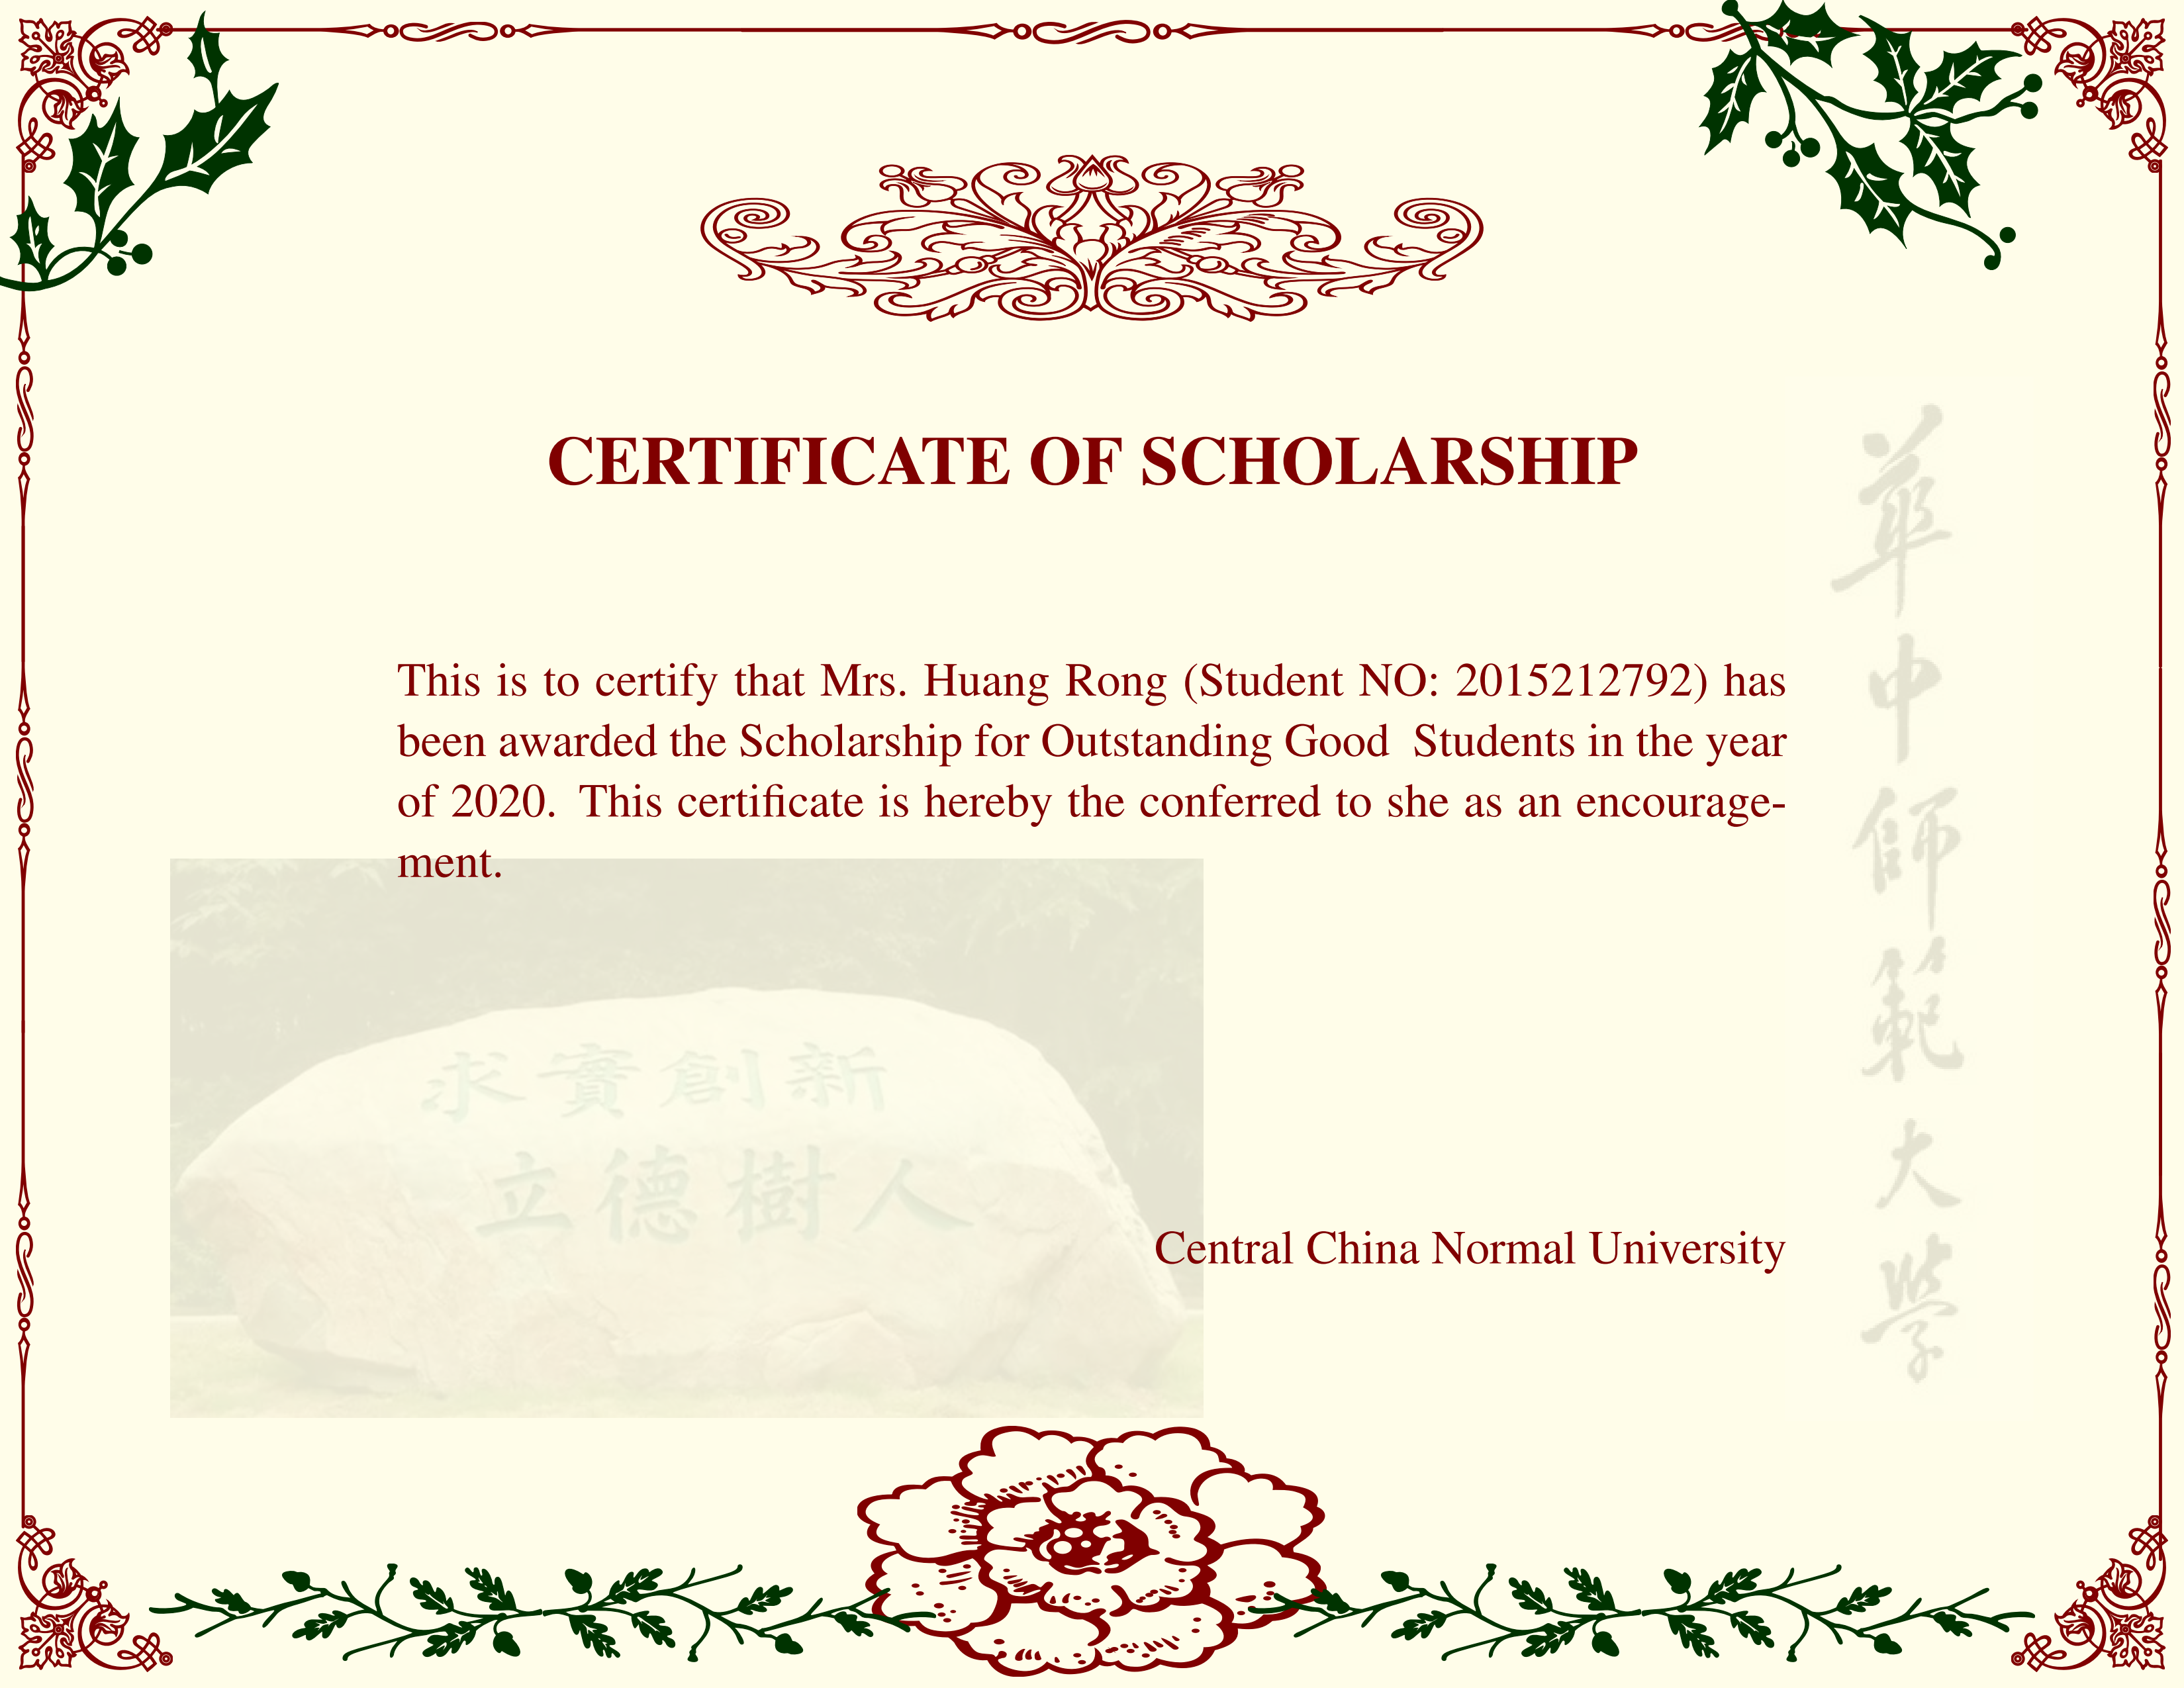 L3实现获奖学金数表信息提取并自动生成奖学金证明证书